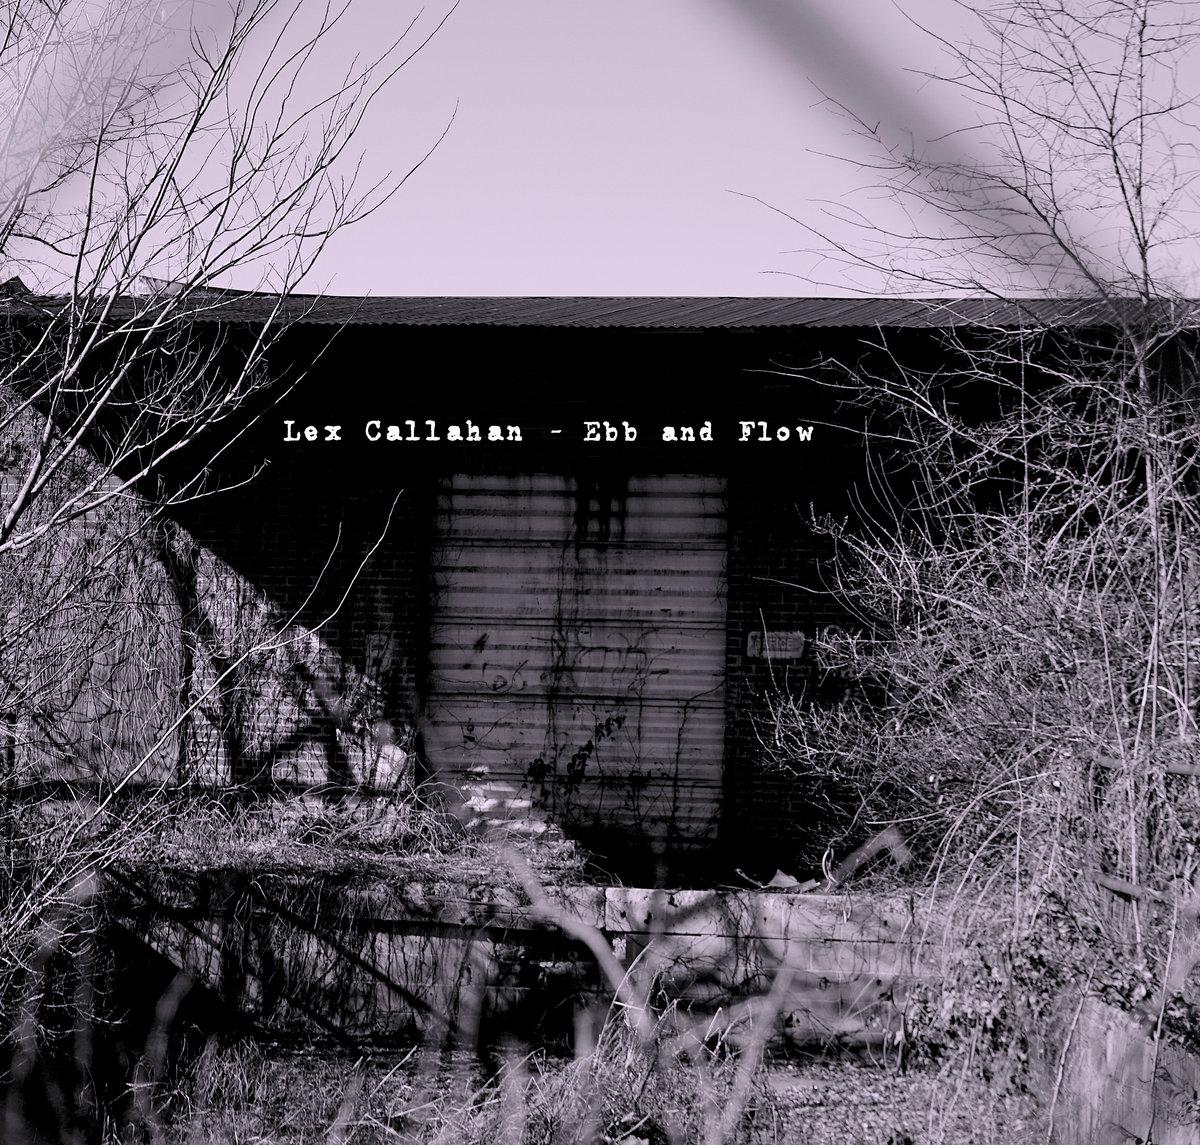 Ebb and Flow - Lex Callahan